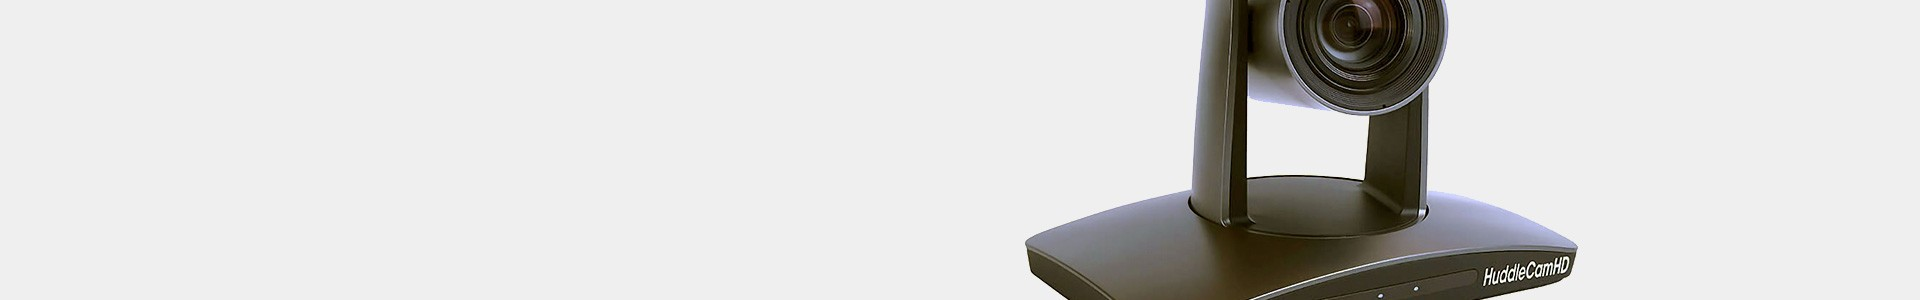 HuddleCamHD professional Webcams - Avacab official dealer